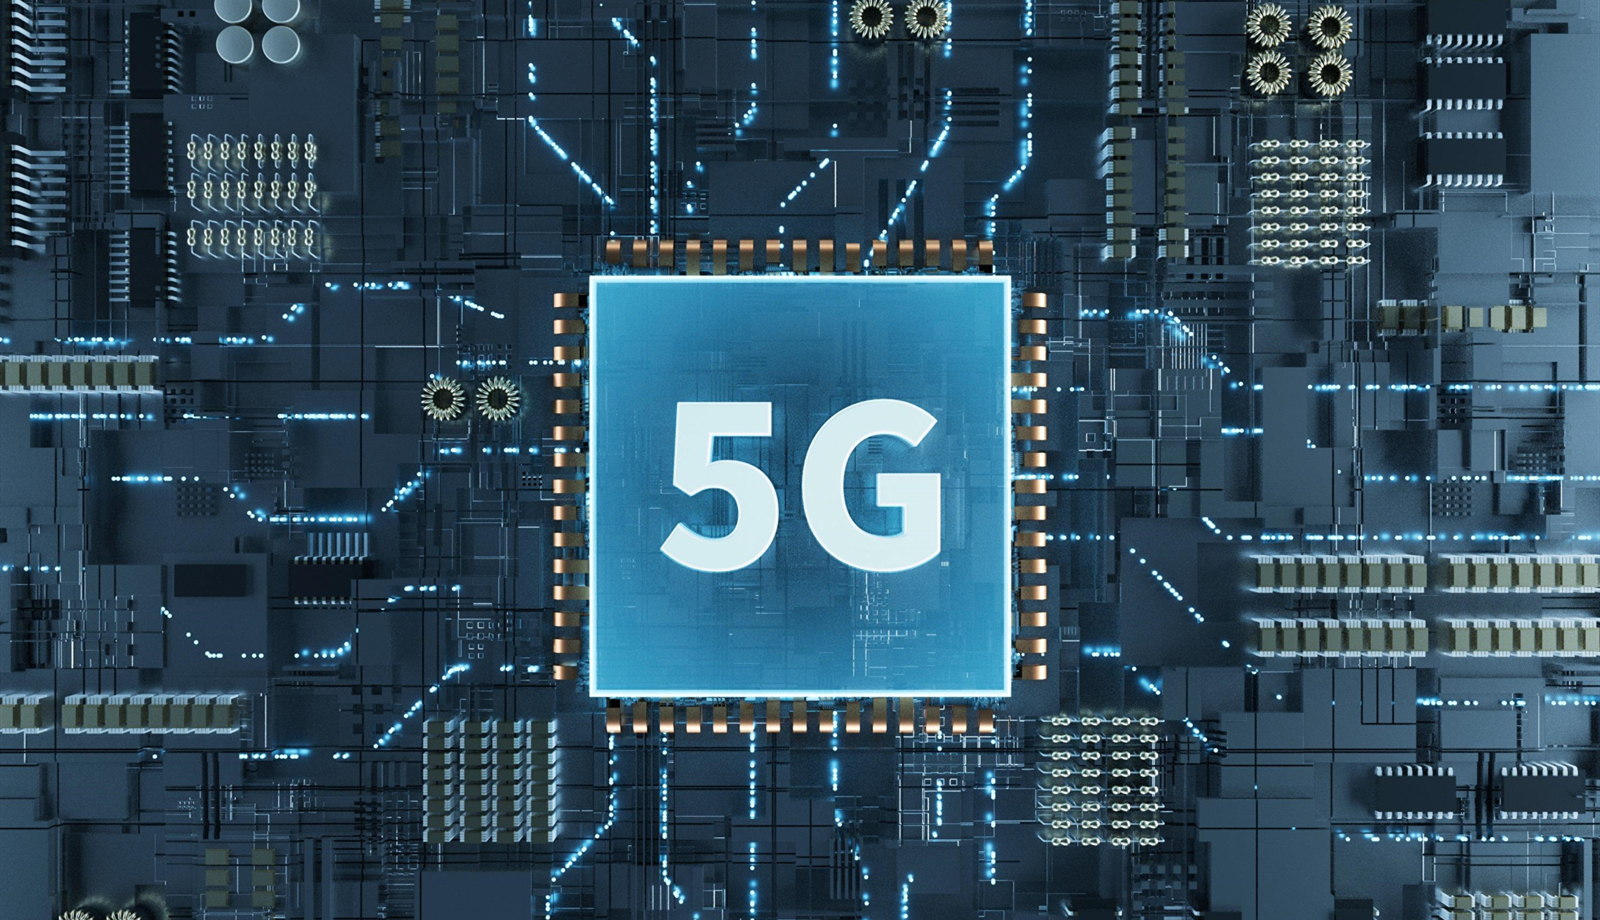 5G的资费到底多贵?看看韩国和美国电信就知道了